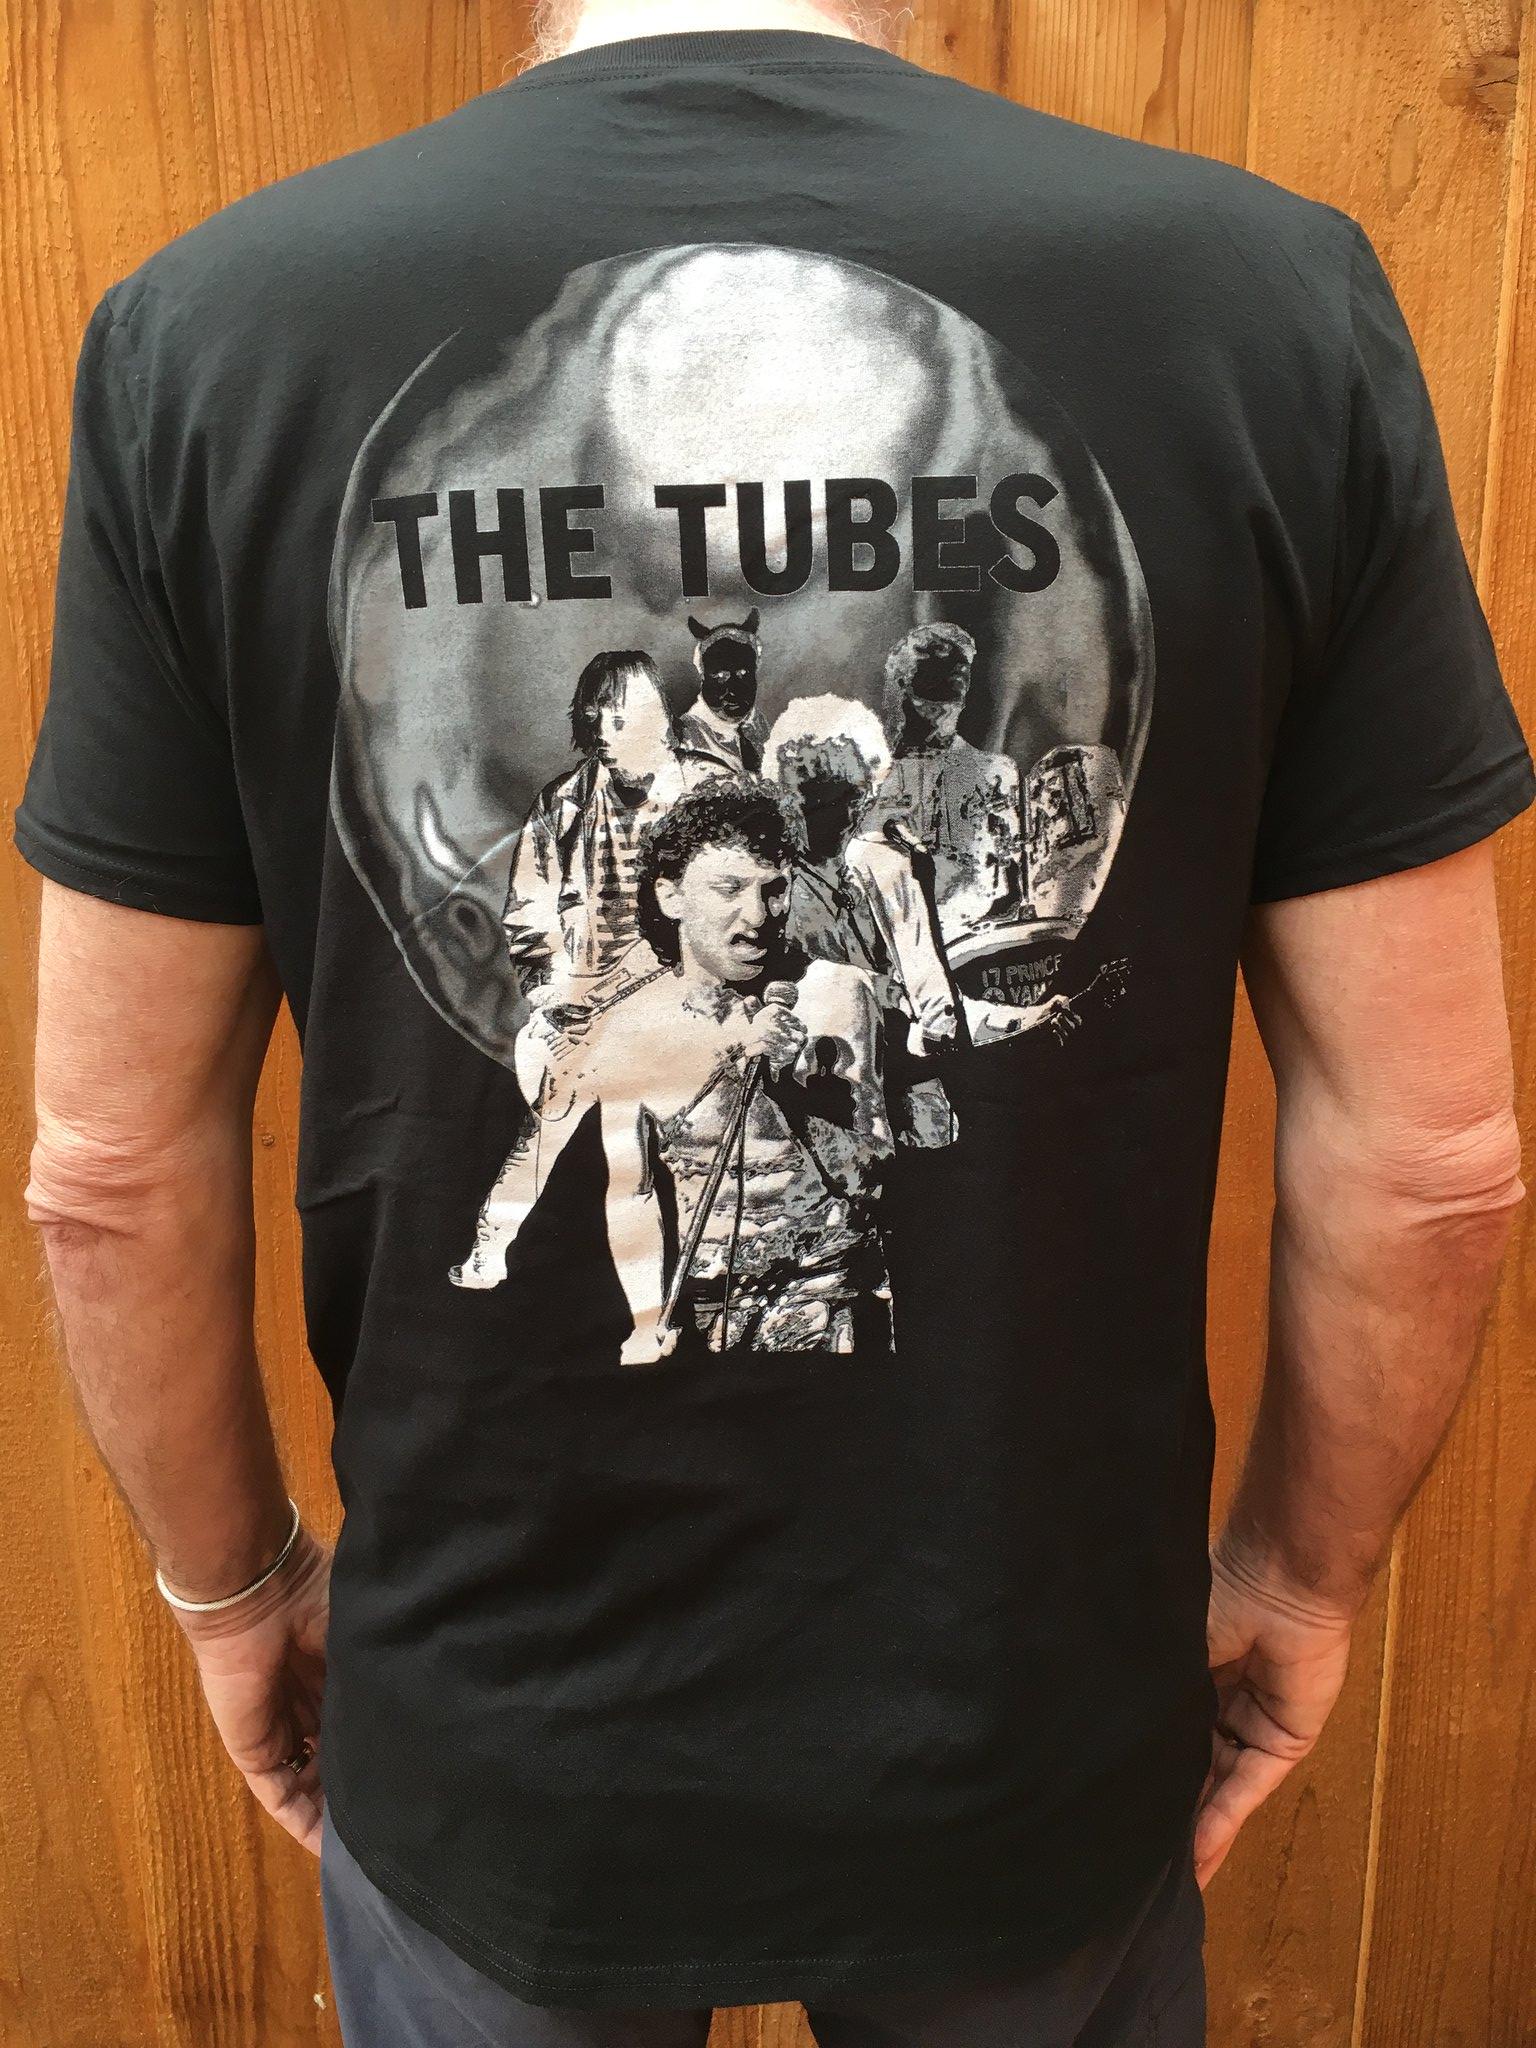 Titanium Tubes T-shirt